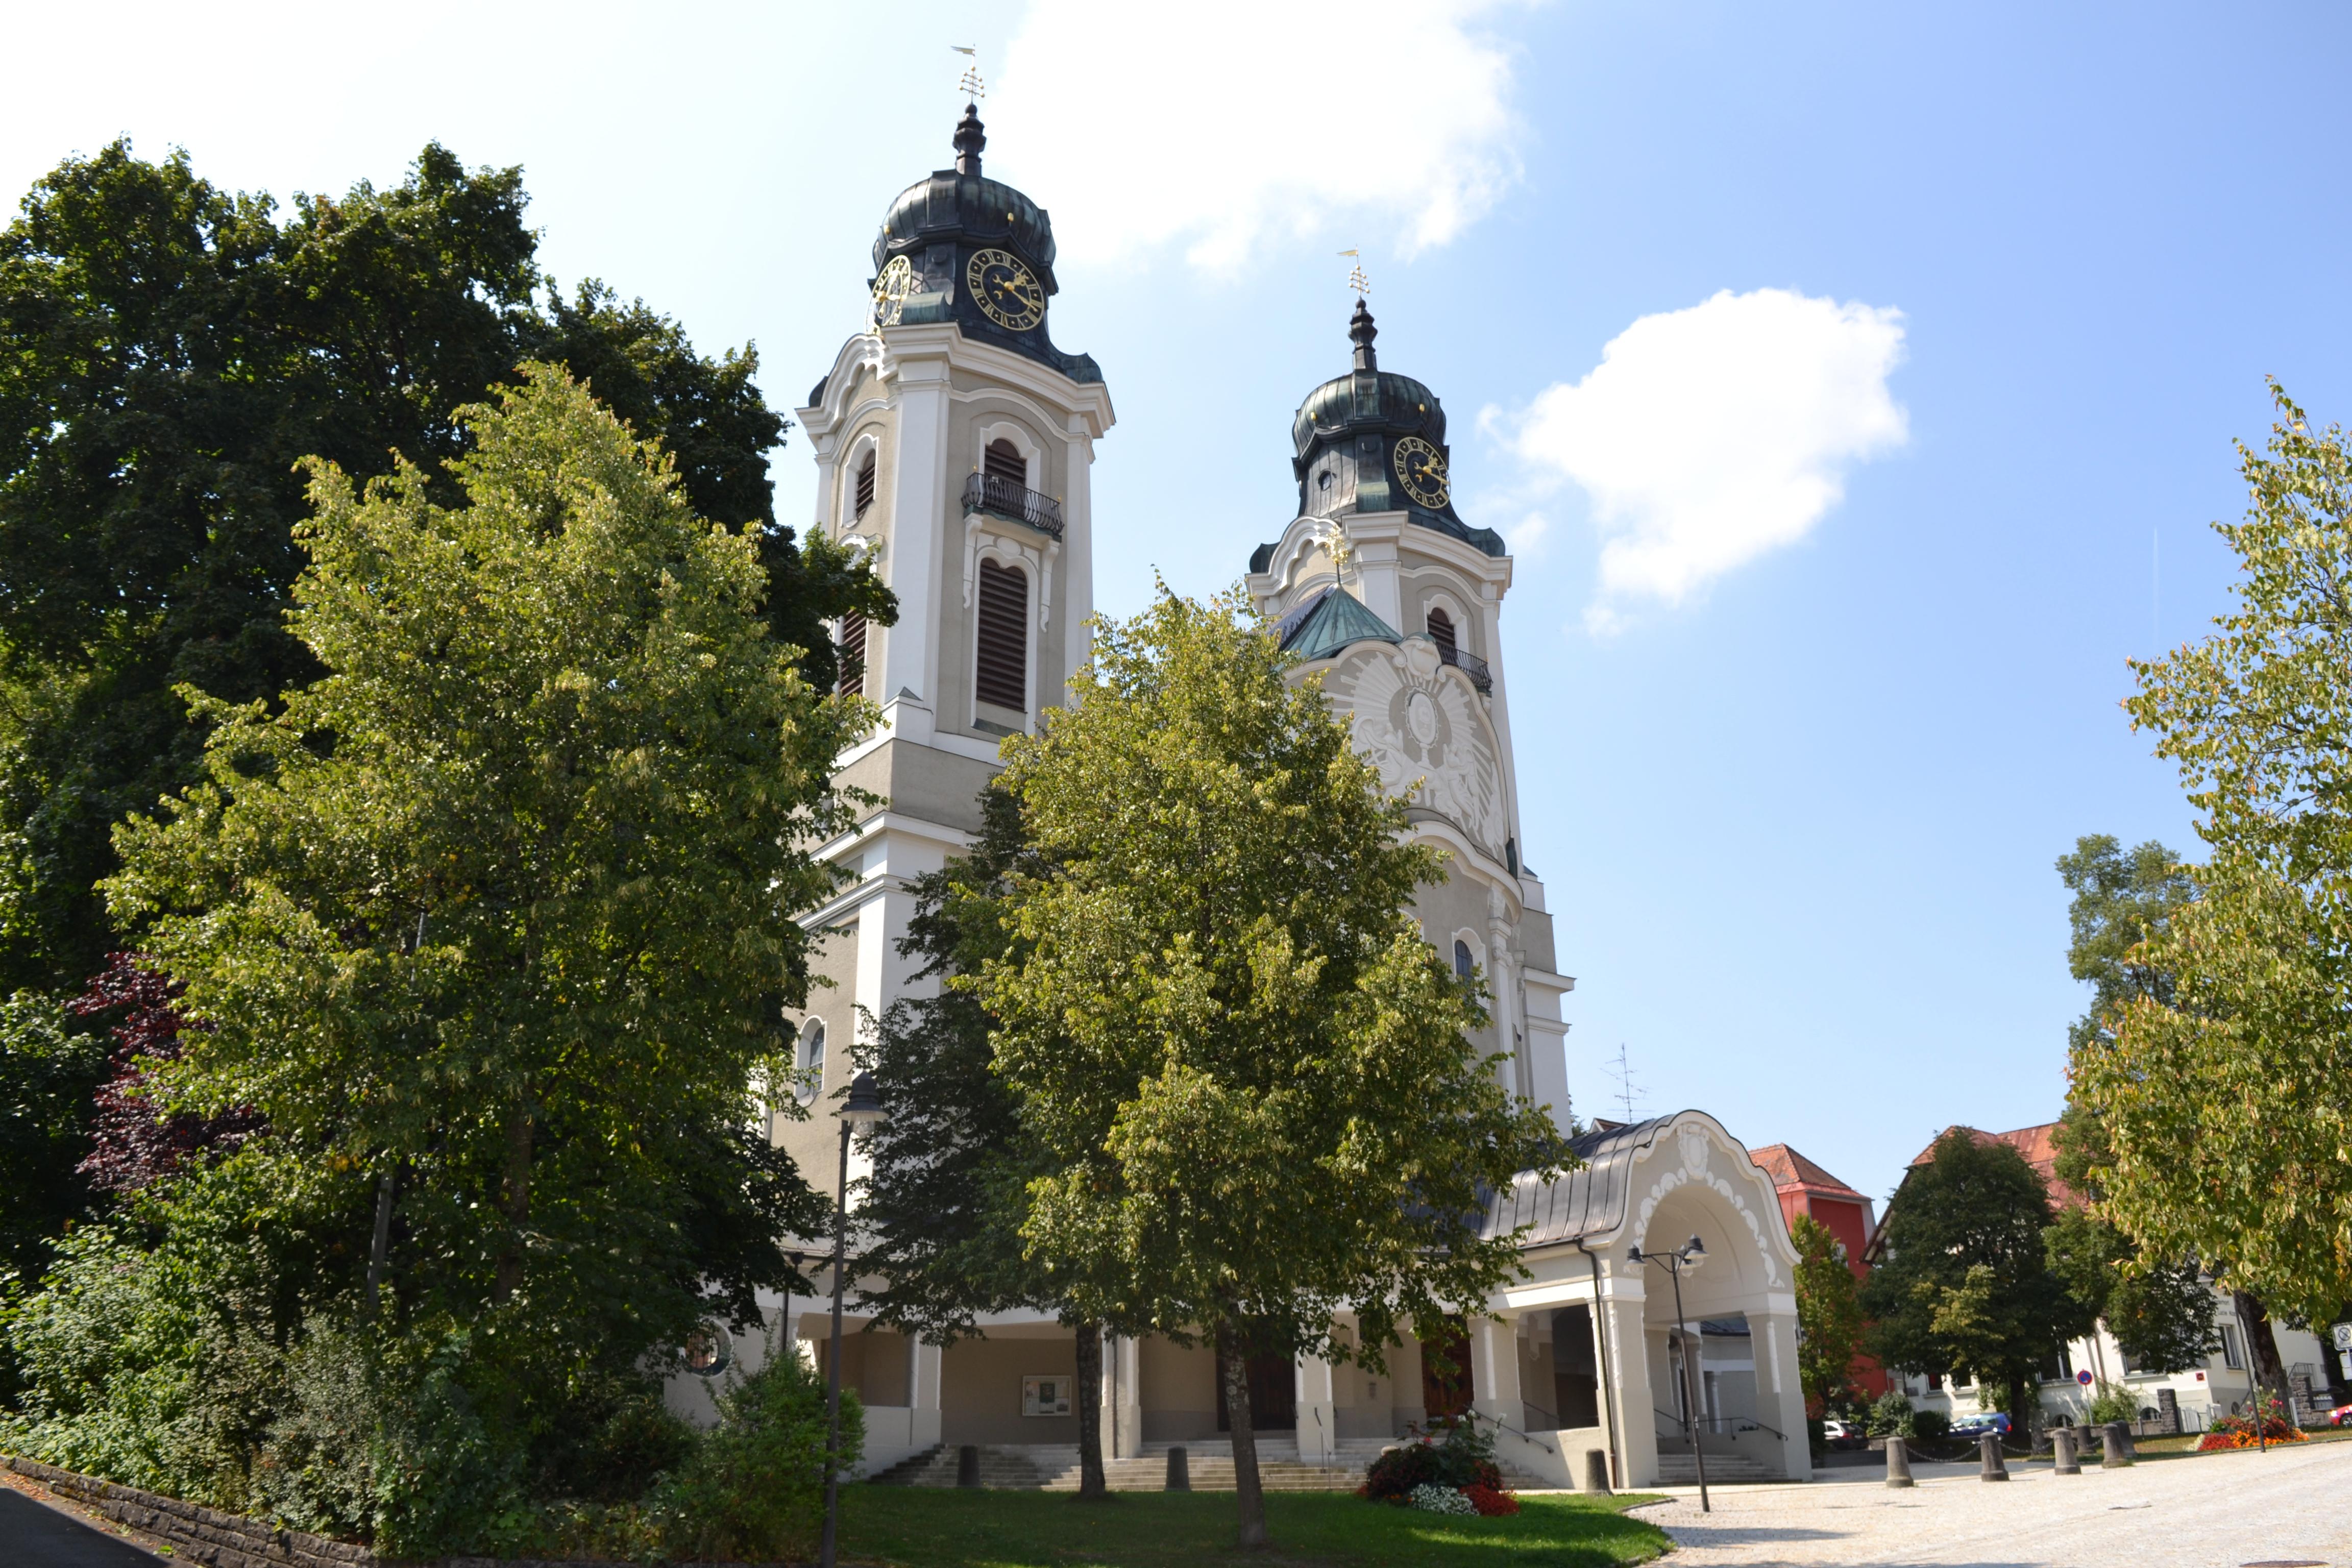 Stadtpfarrkirche St. Peter und Paul